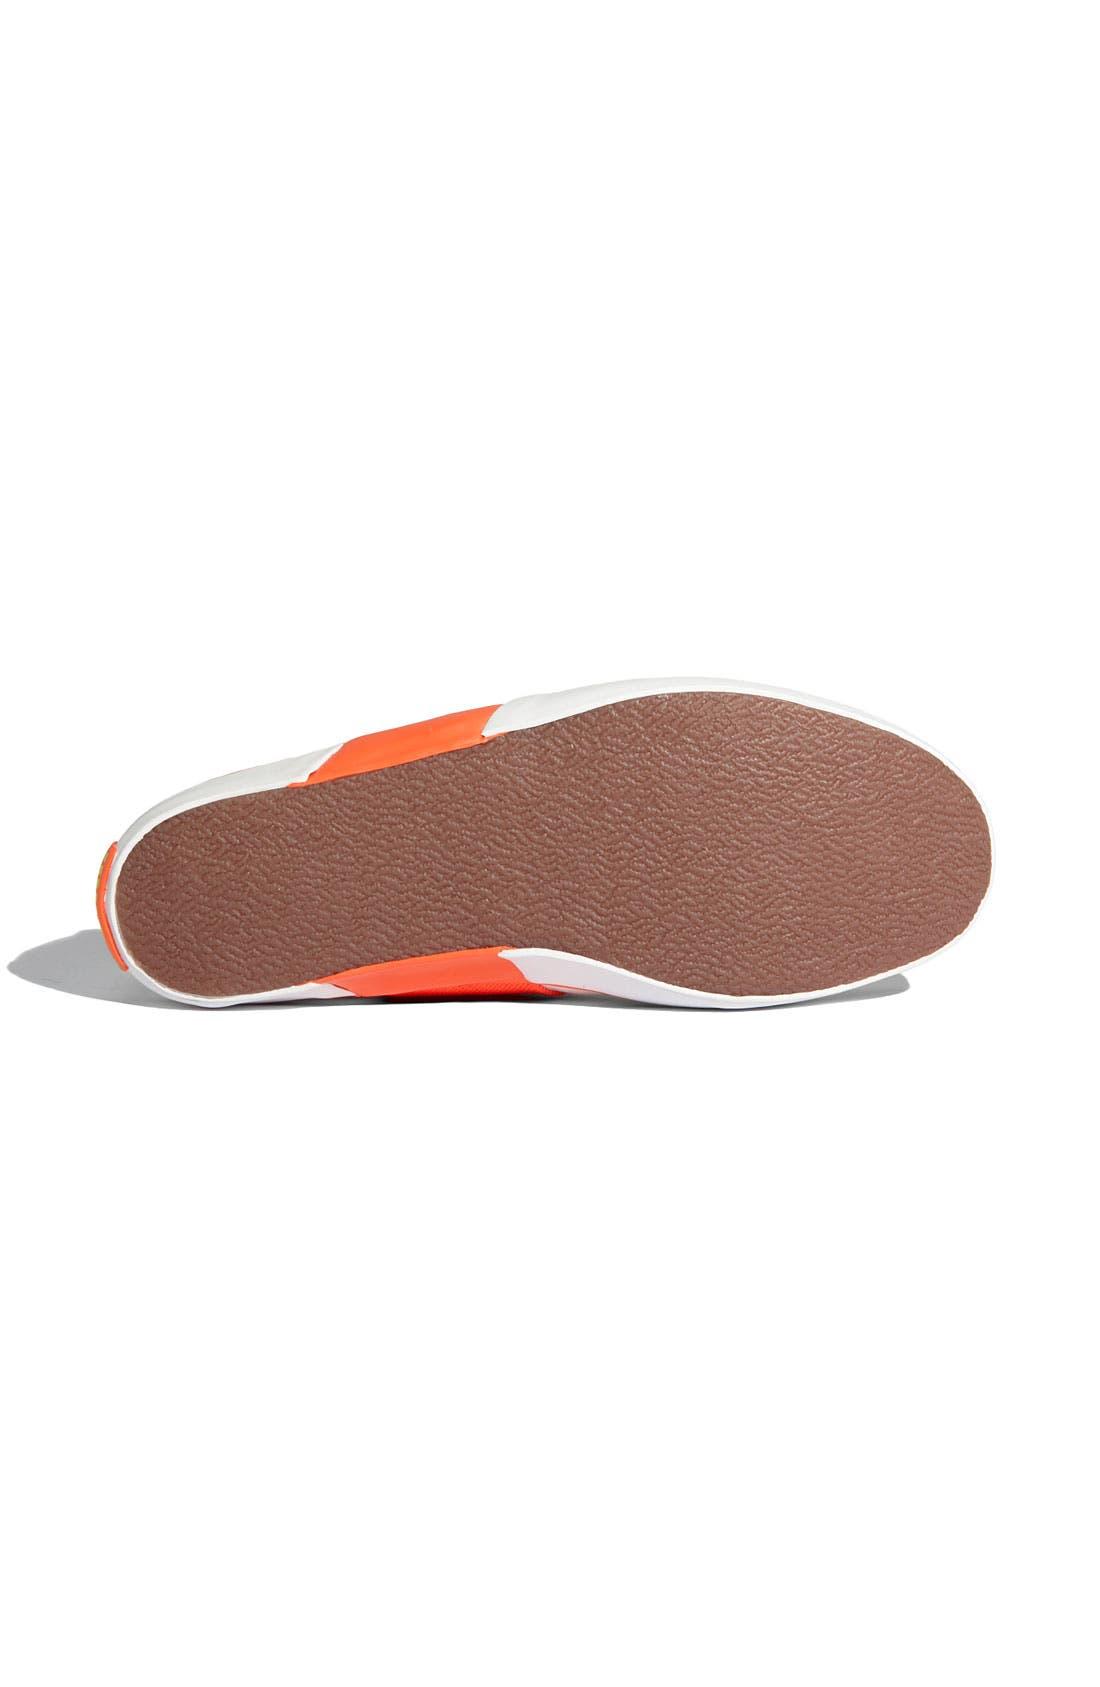 Alternate Image 4  - PUMA 'Lazy' Sneaker (Women)